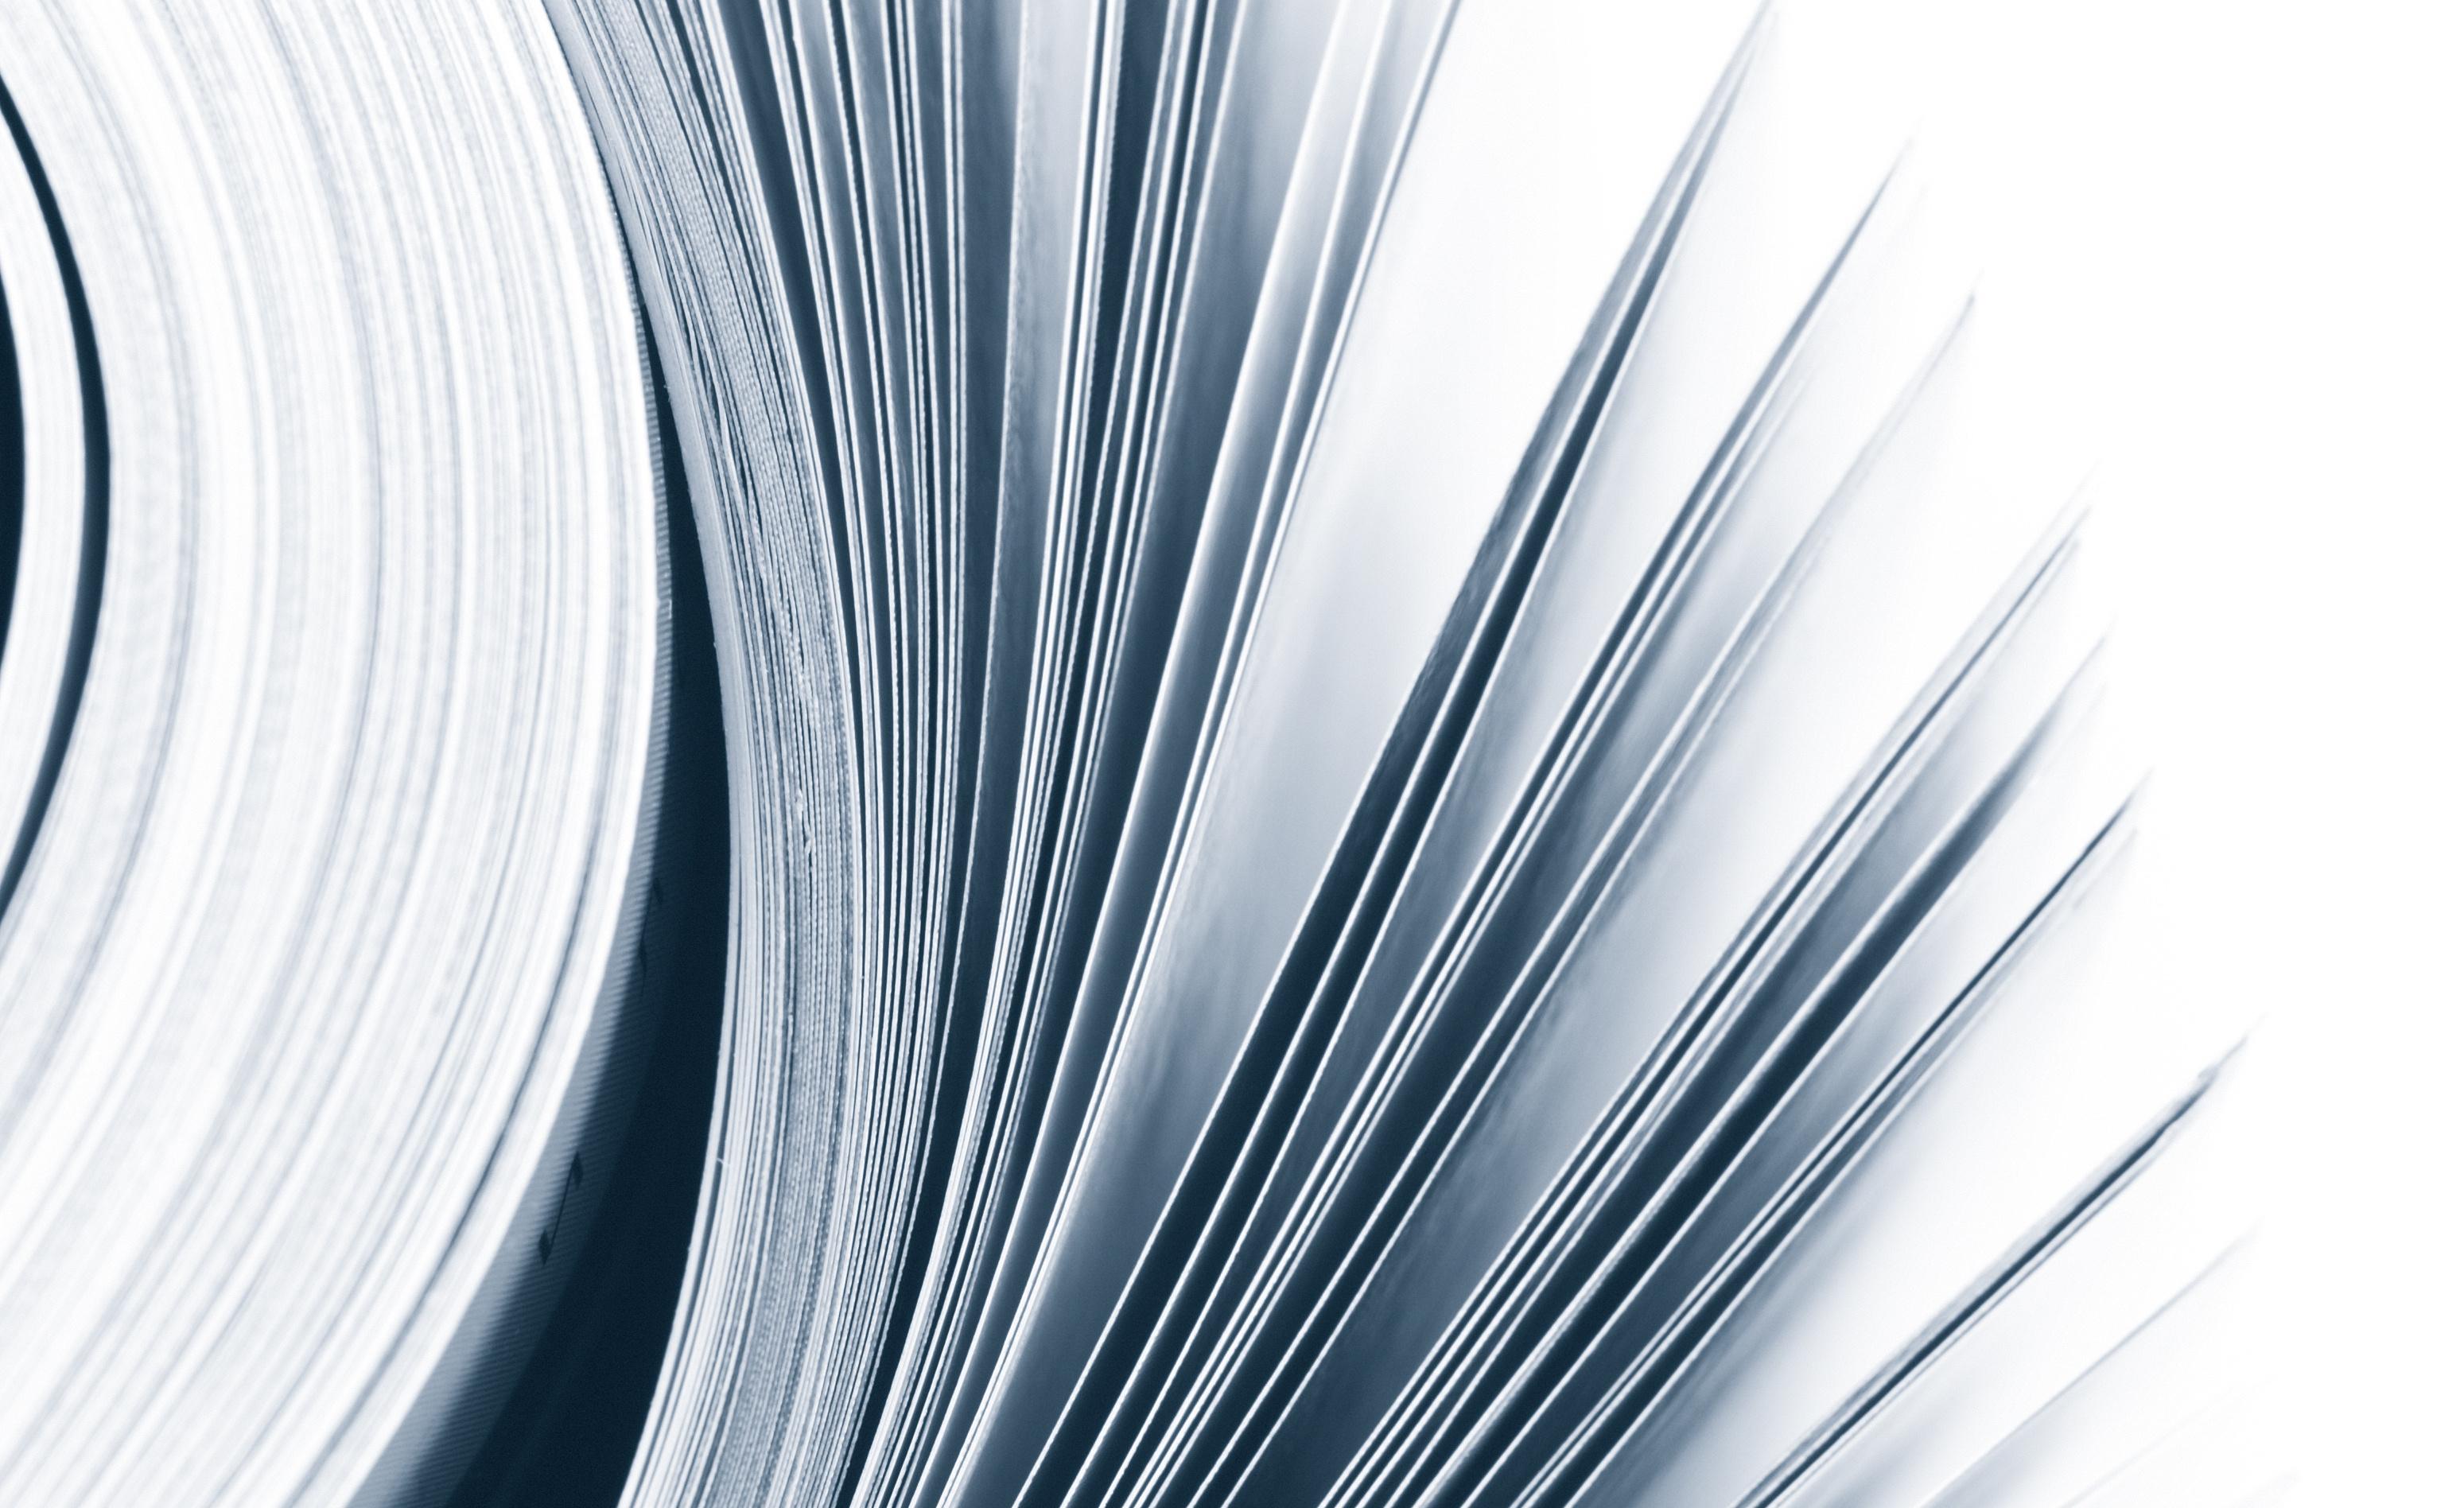 Close-up of magazine pages on white background. Toned monochrome image. Shallow DOF, focus on edges.